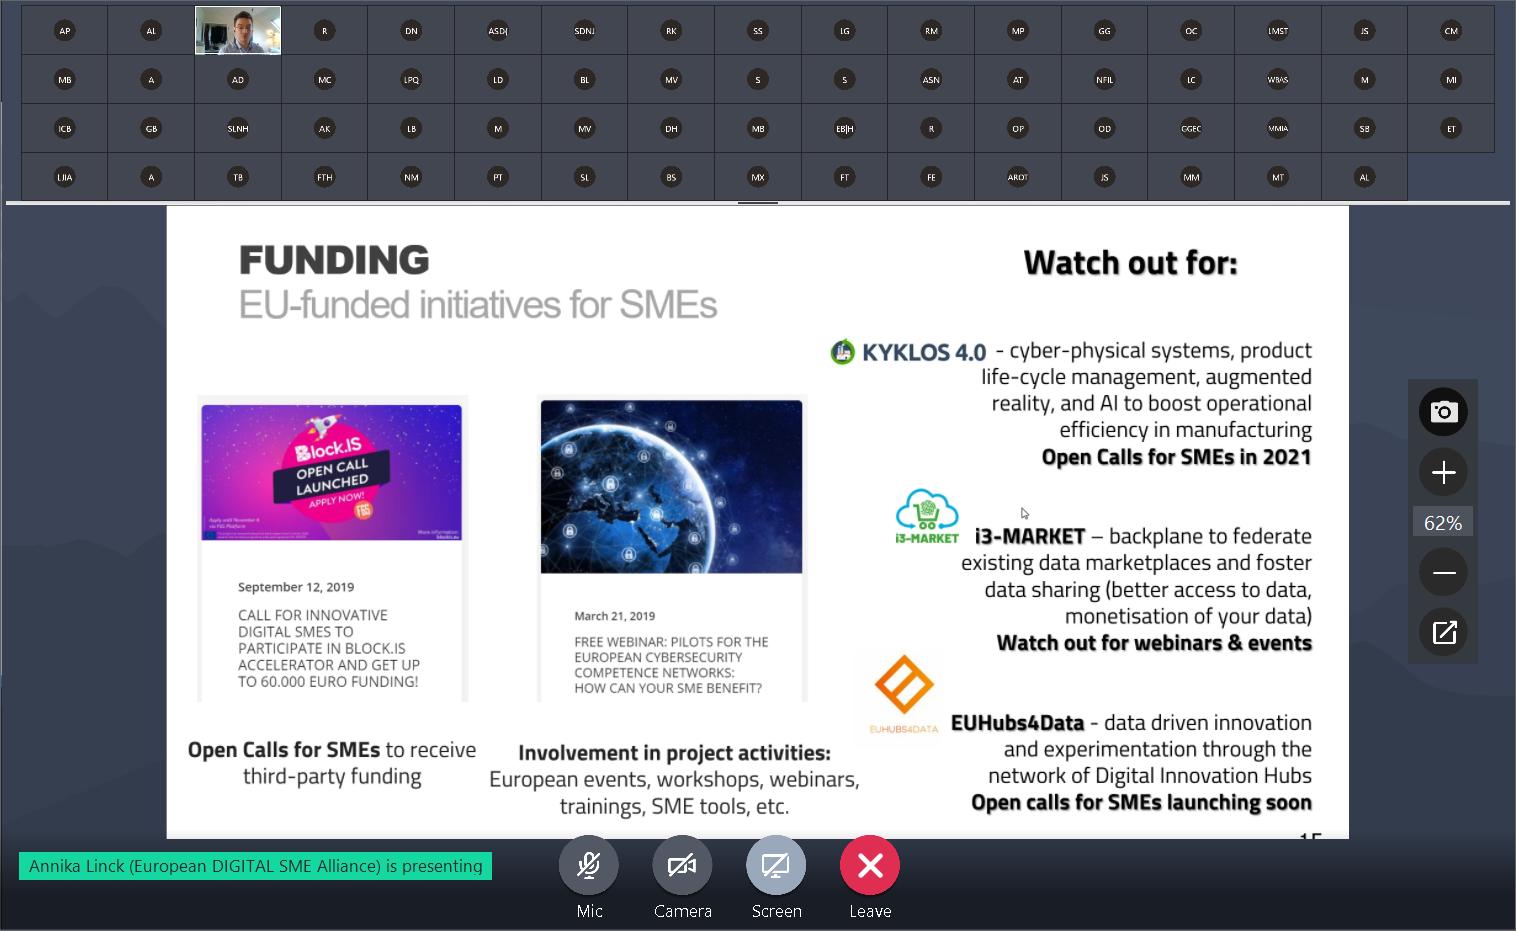 SME Focus Group on AI November 2020: trustworthy AI for SMEs 6